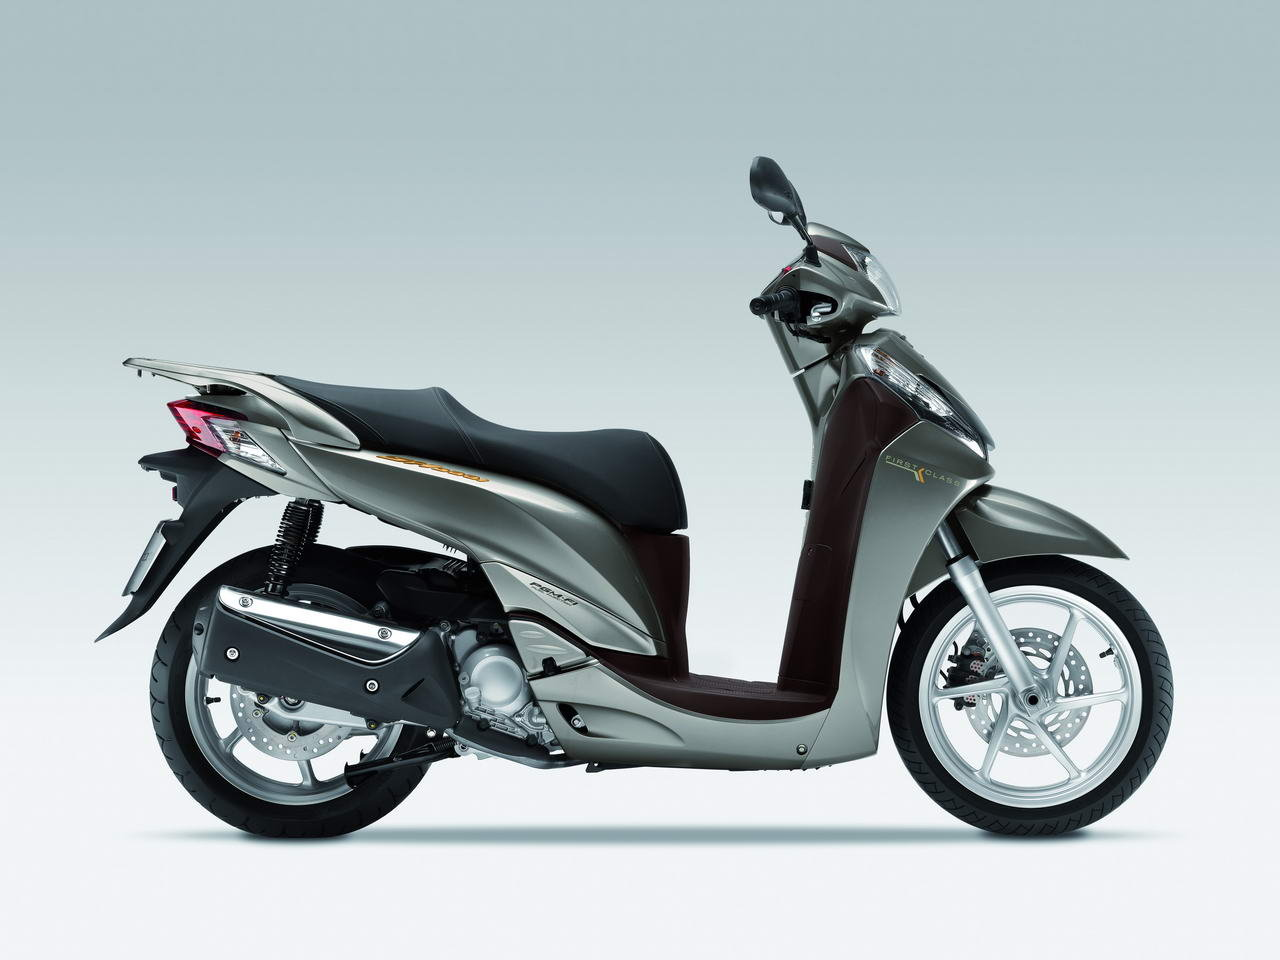 Listino Honda Integra 750 ABSS Scooter oltre 300 - image 14715_honda-sh300ispecial on http://moto.motori.net